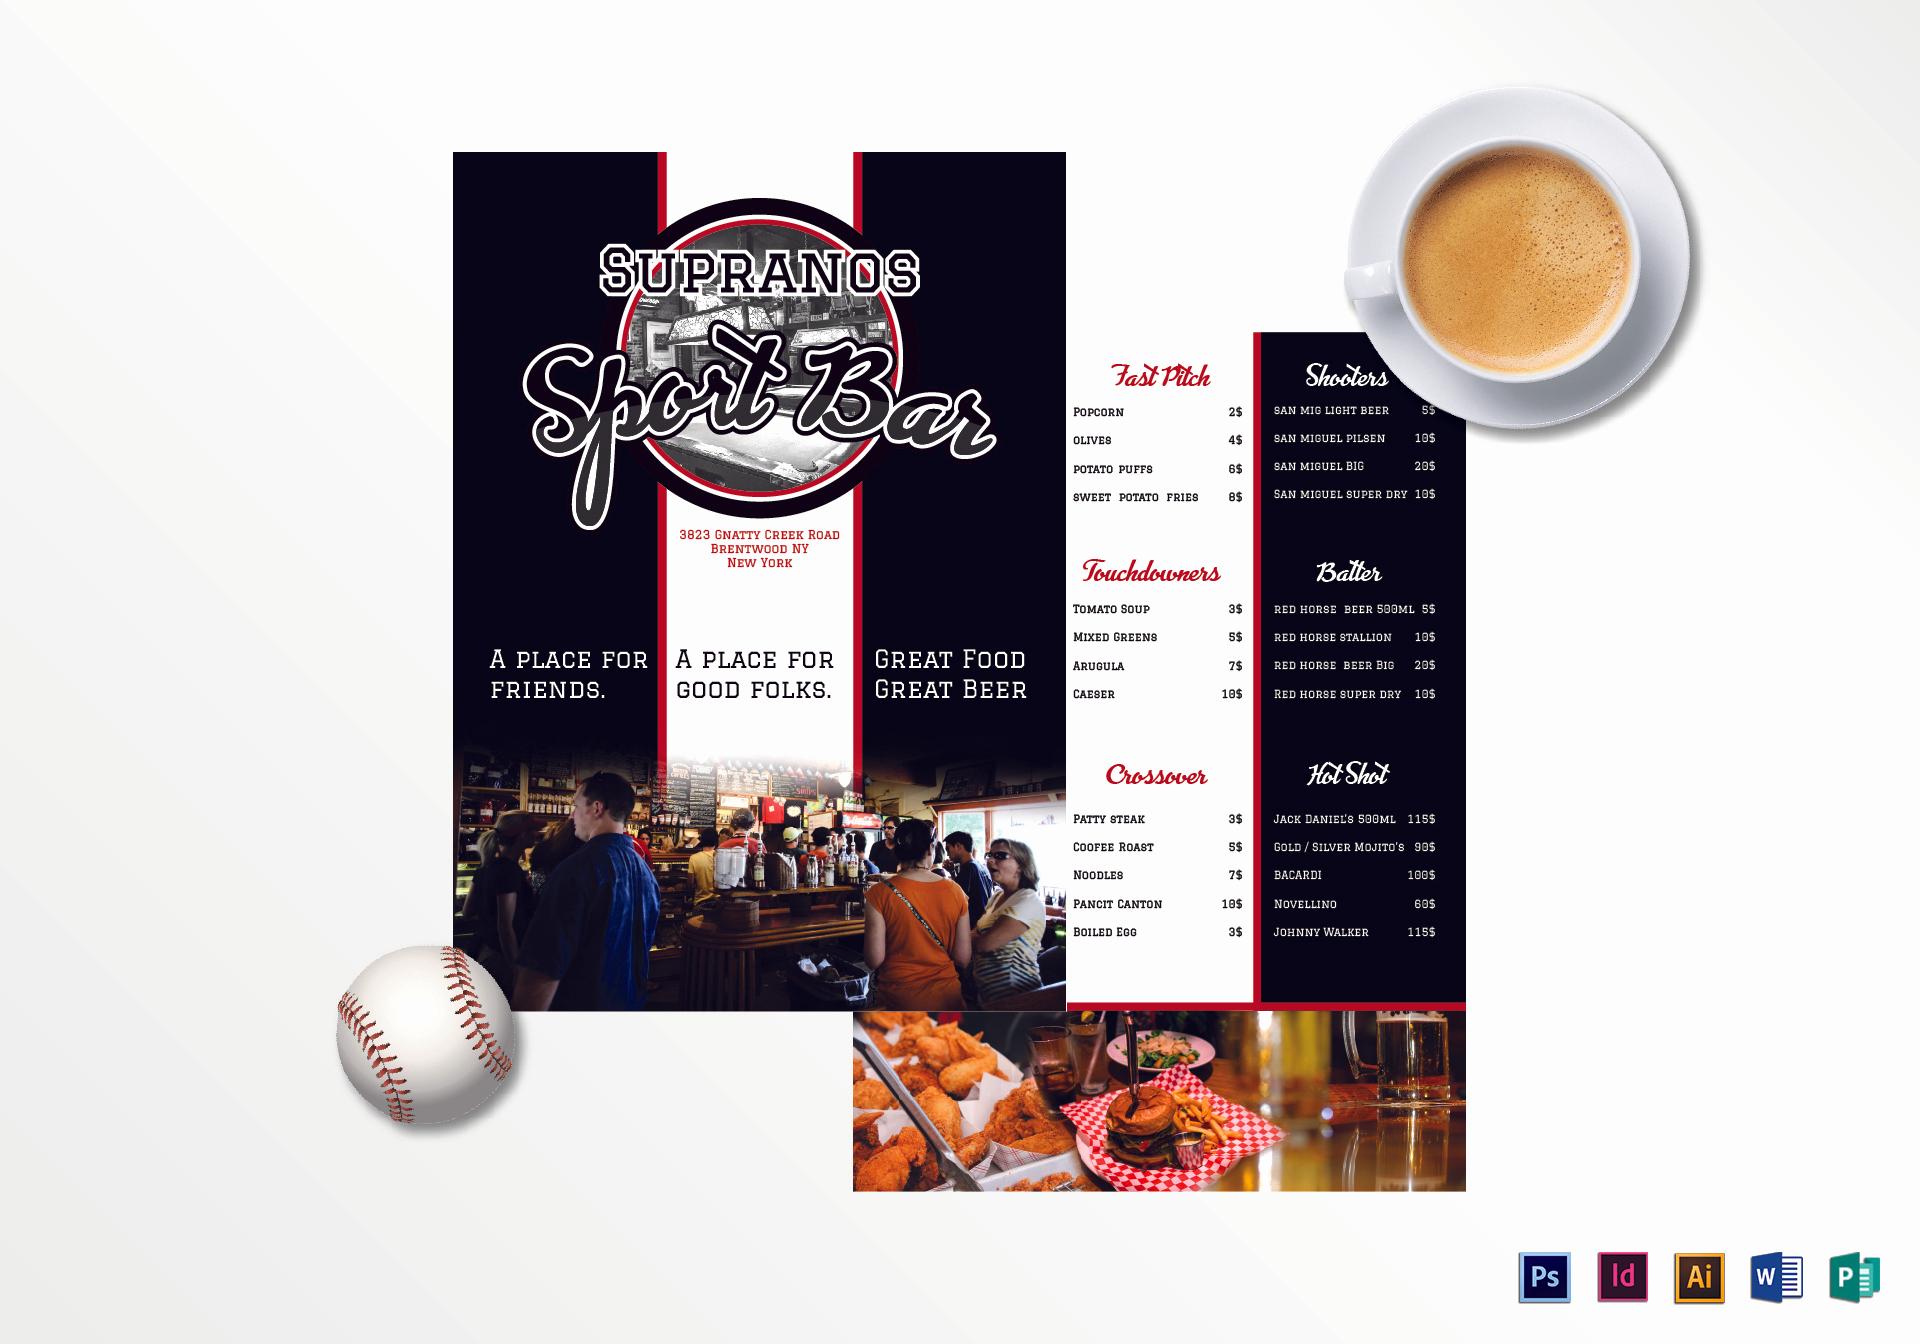 Sports Bar Menu Template Inspirational Sports Bar Menu Design Template In Psd Word Publisher